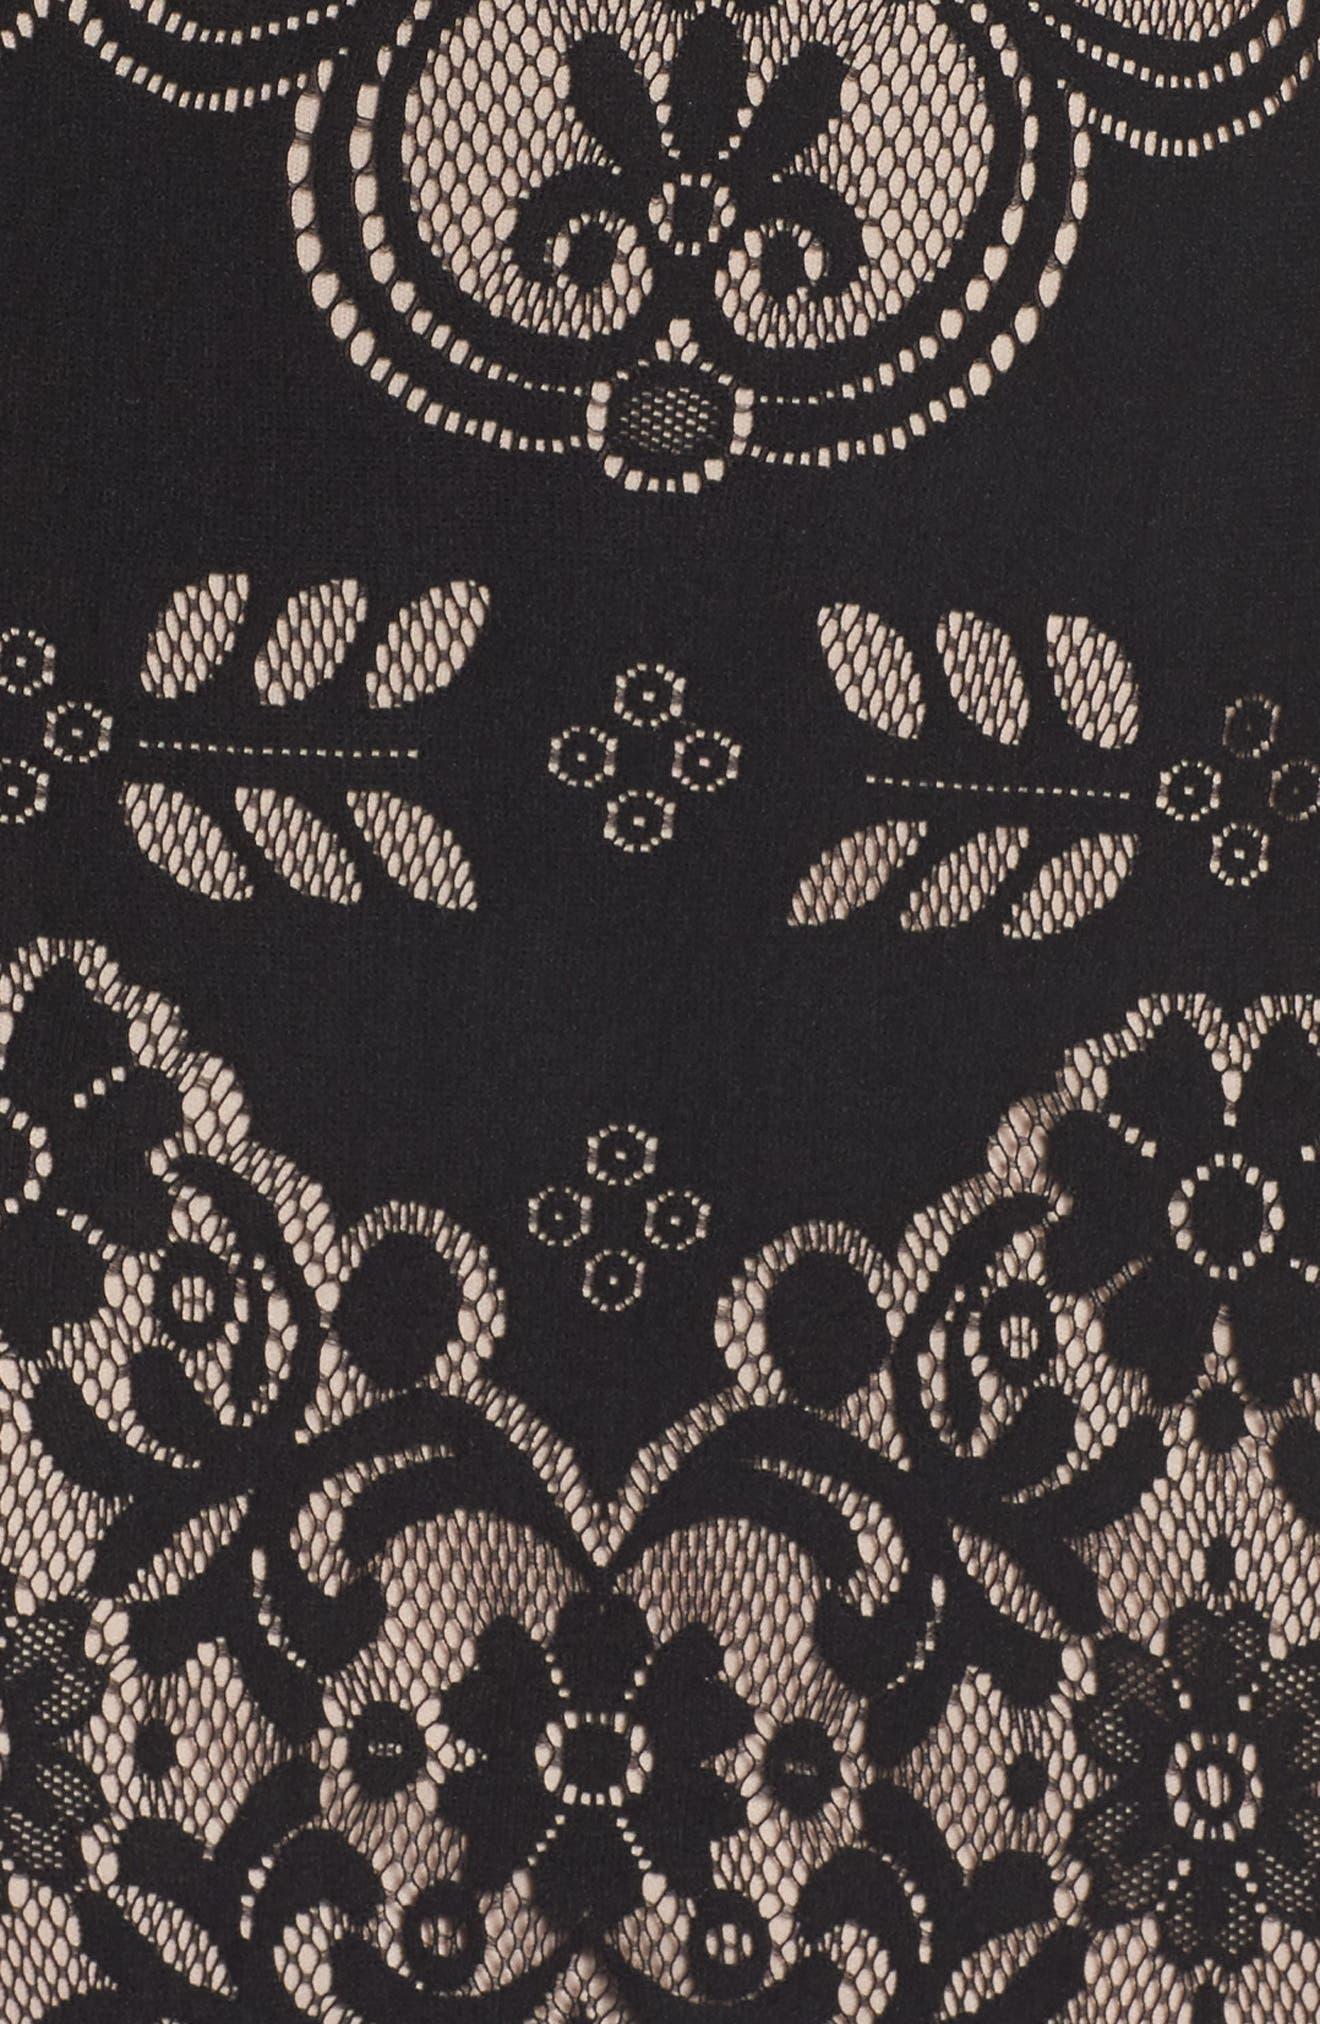 Lace V-Neck Gown,                             Alternate thumbnail 5, color,                             Black/ Nude